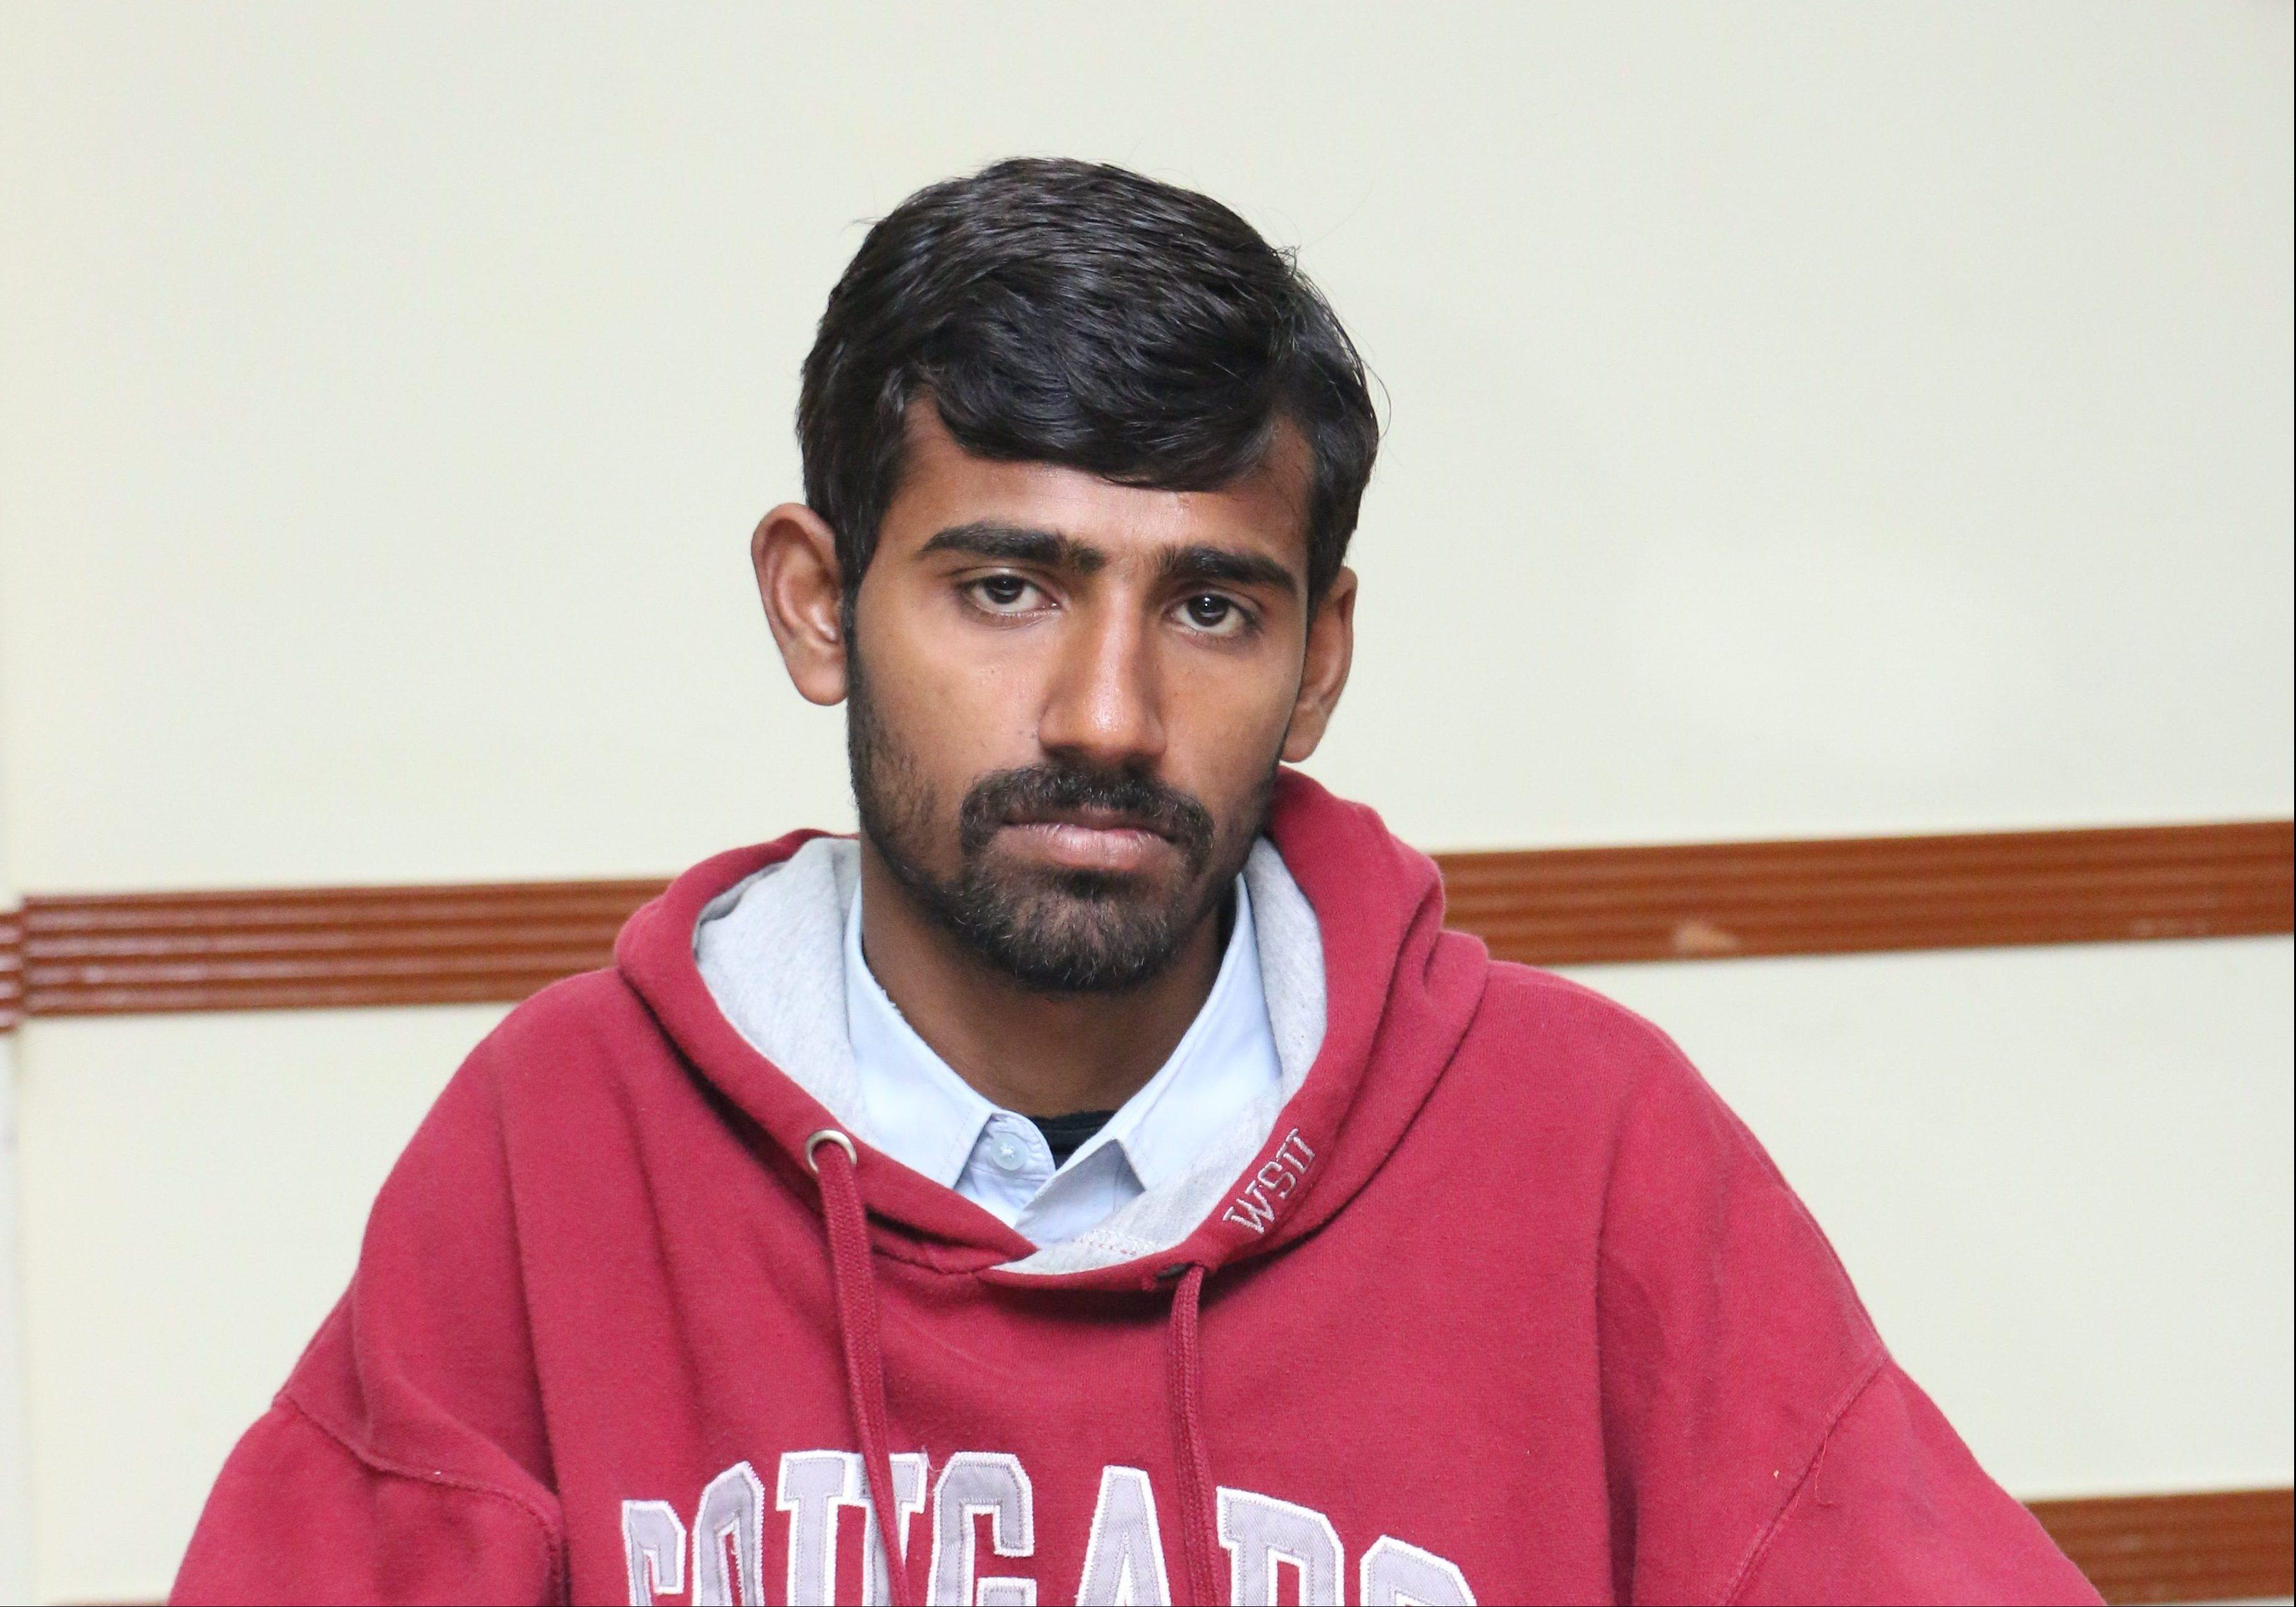 Adnan Afzal - Pest Control Operator